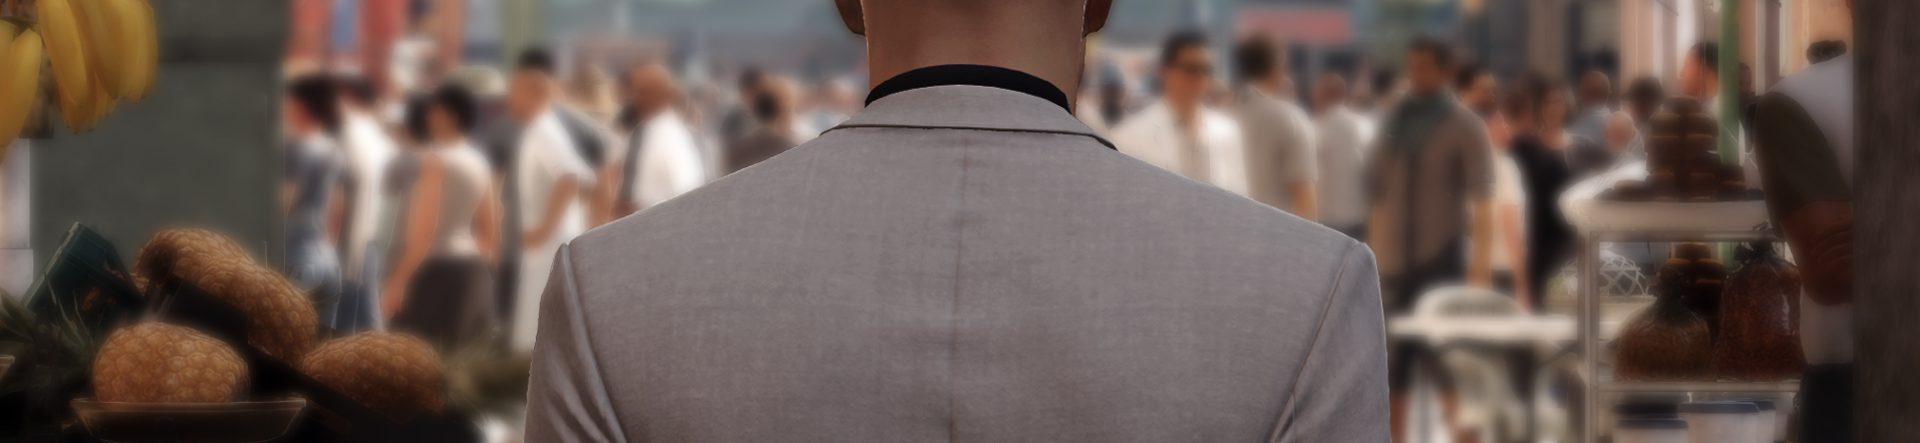 Hitman Episode 3 Release Date Confirmed as New Trailer Drops - Team VVV